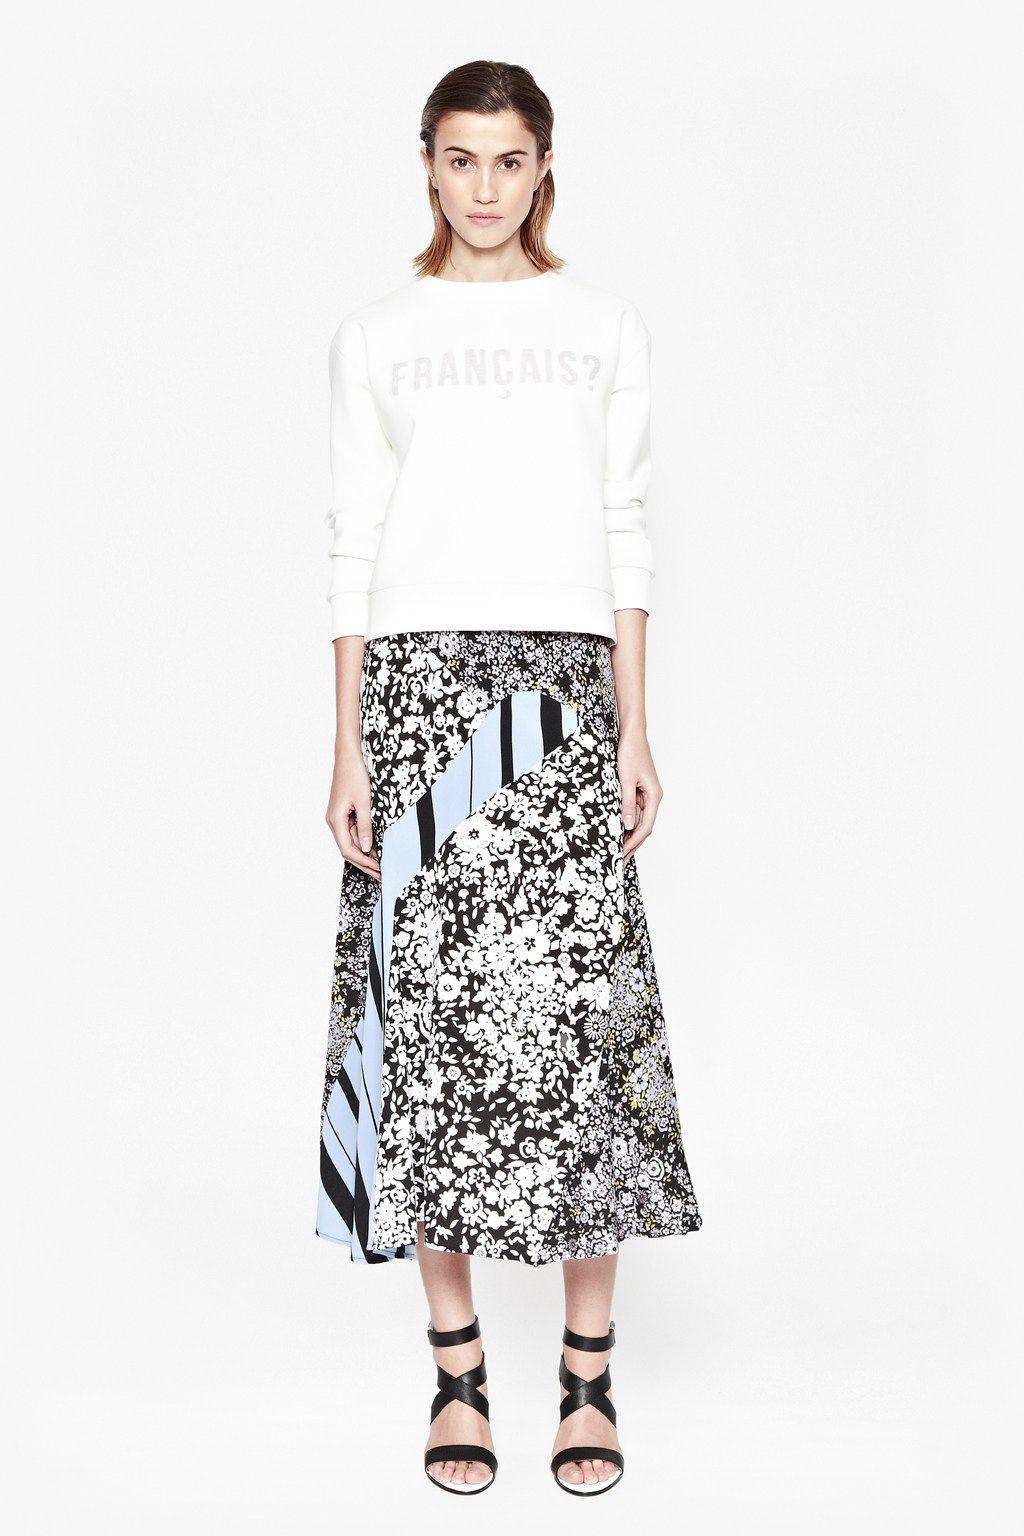 Freida Flower Maxi Skirt - Skirts - French Connection Usa